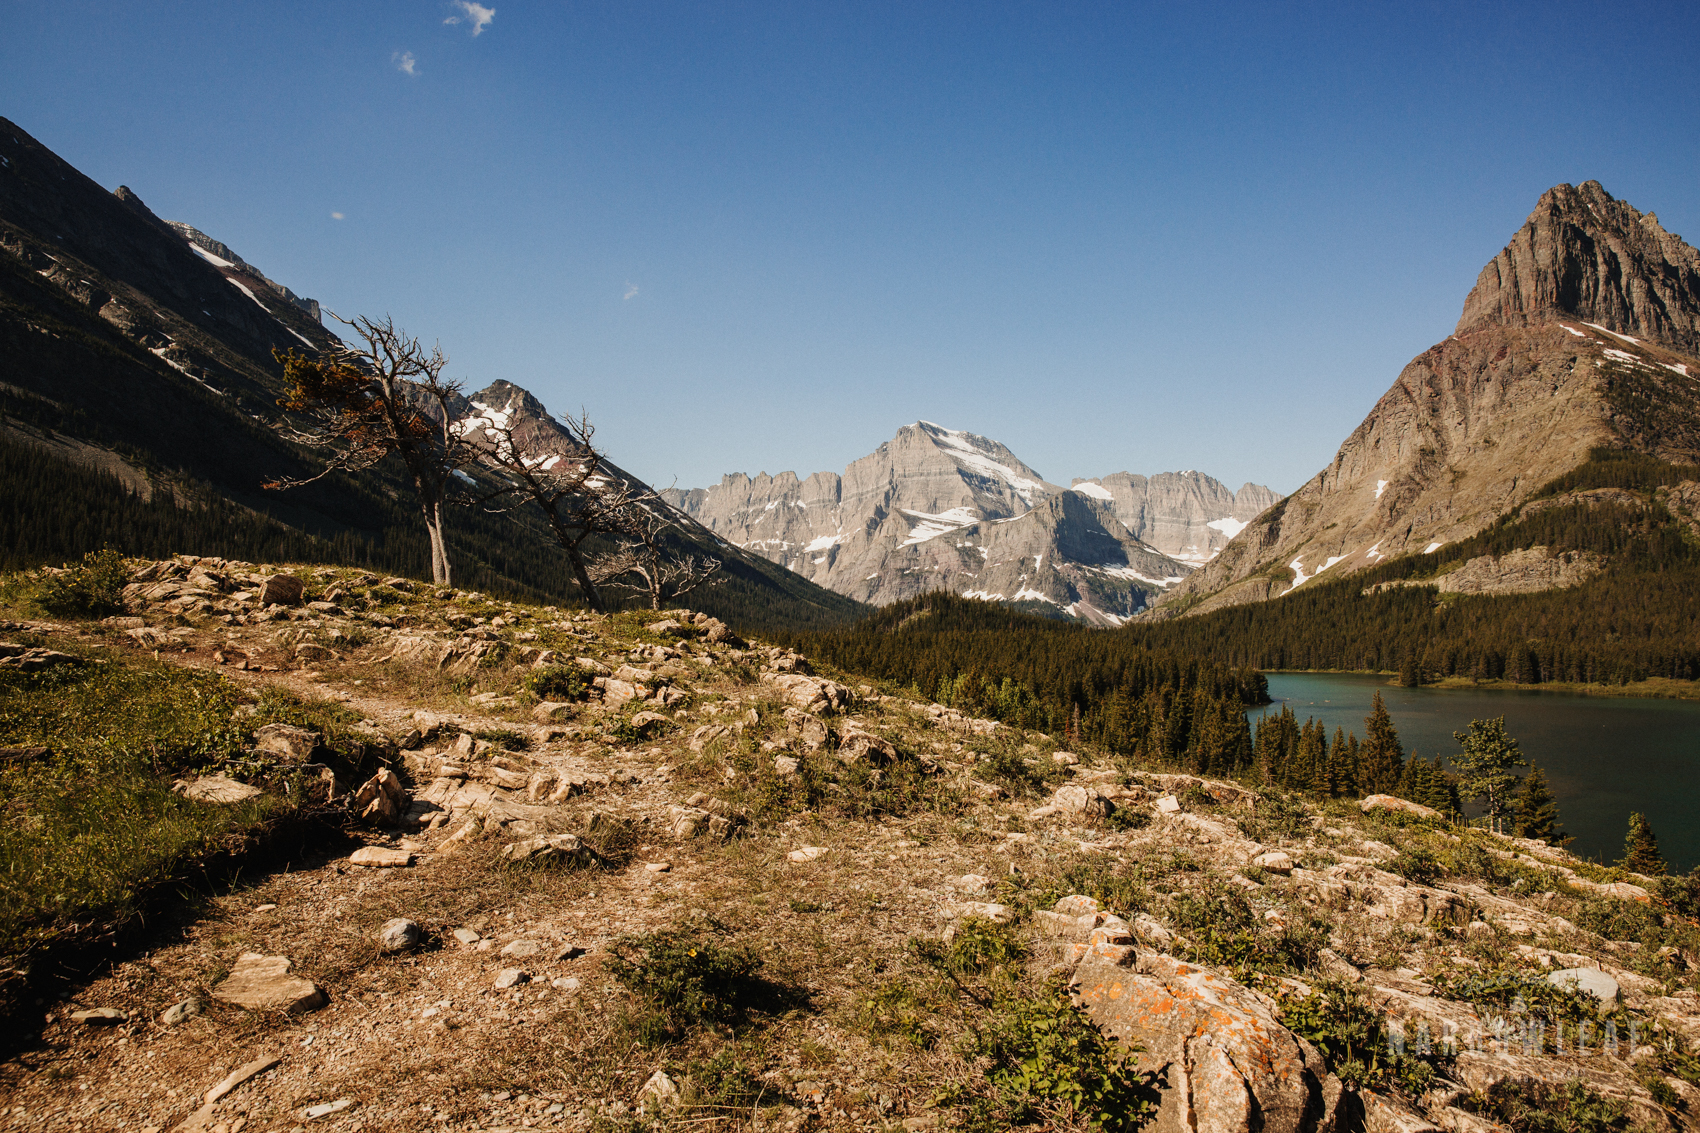 Montana-Glacier-National-Park-Many-Glacier-Narrowleaf-Love-and-Adventure-elopement-Photography-9329.jpg